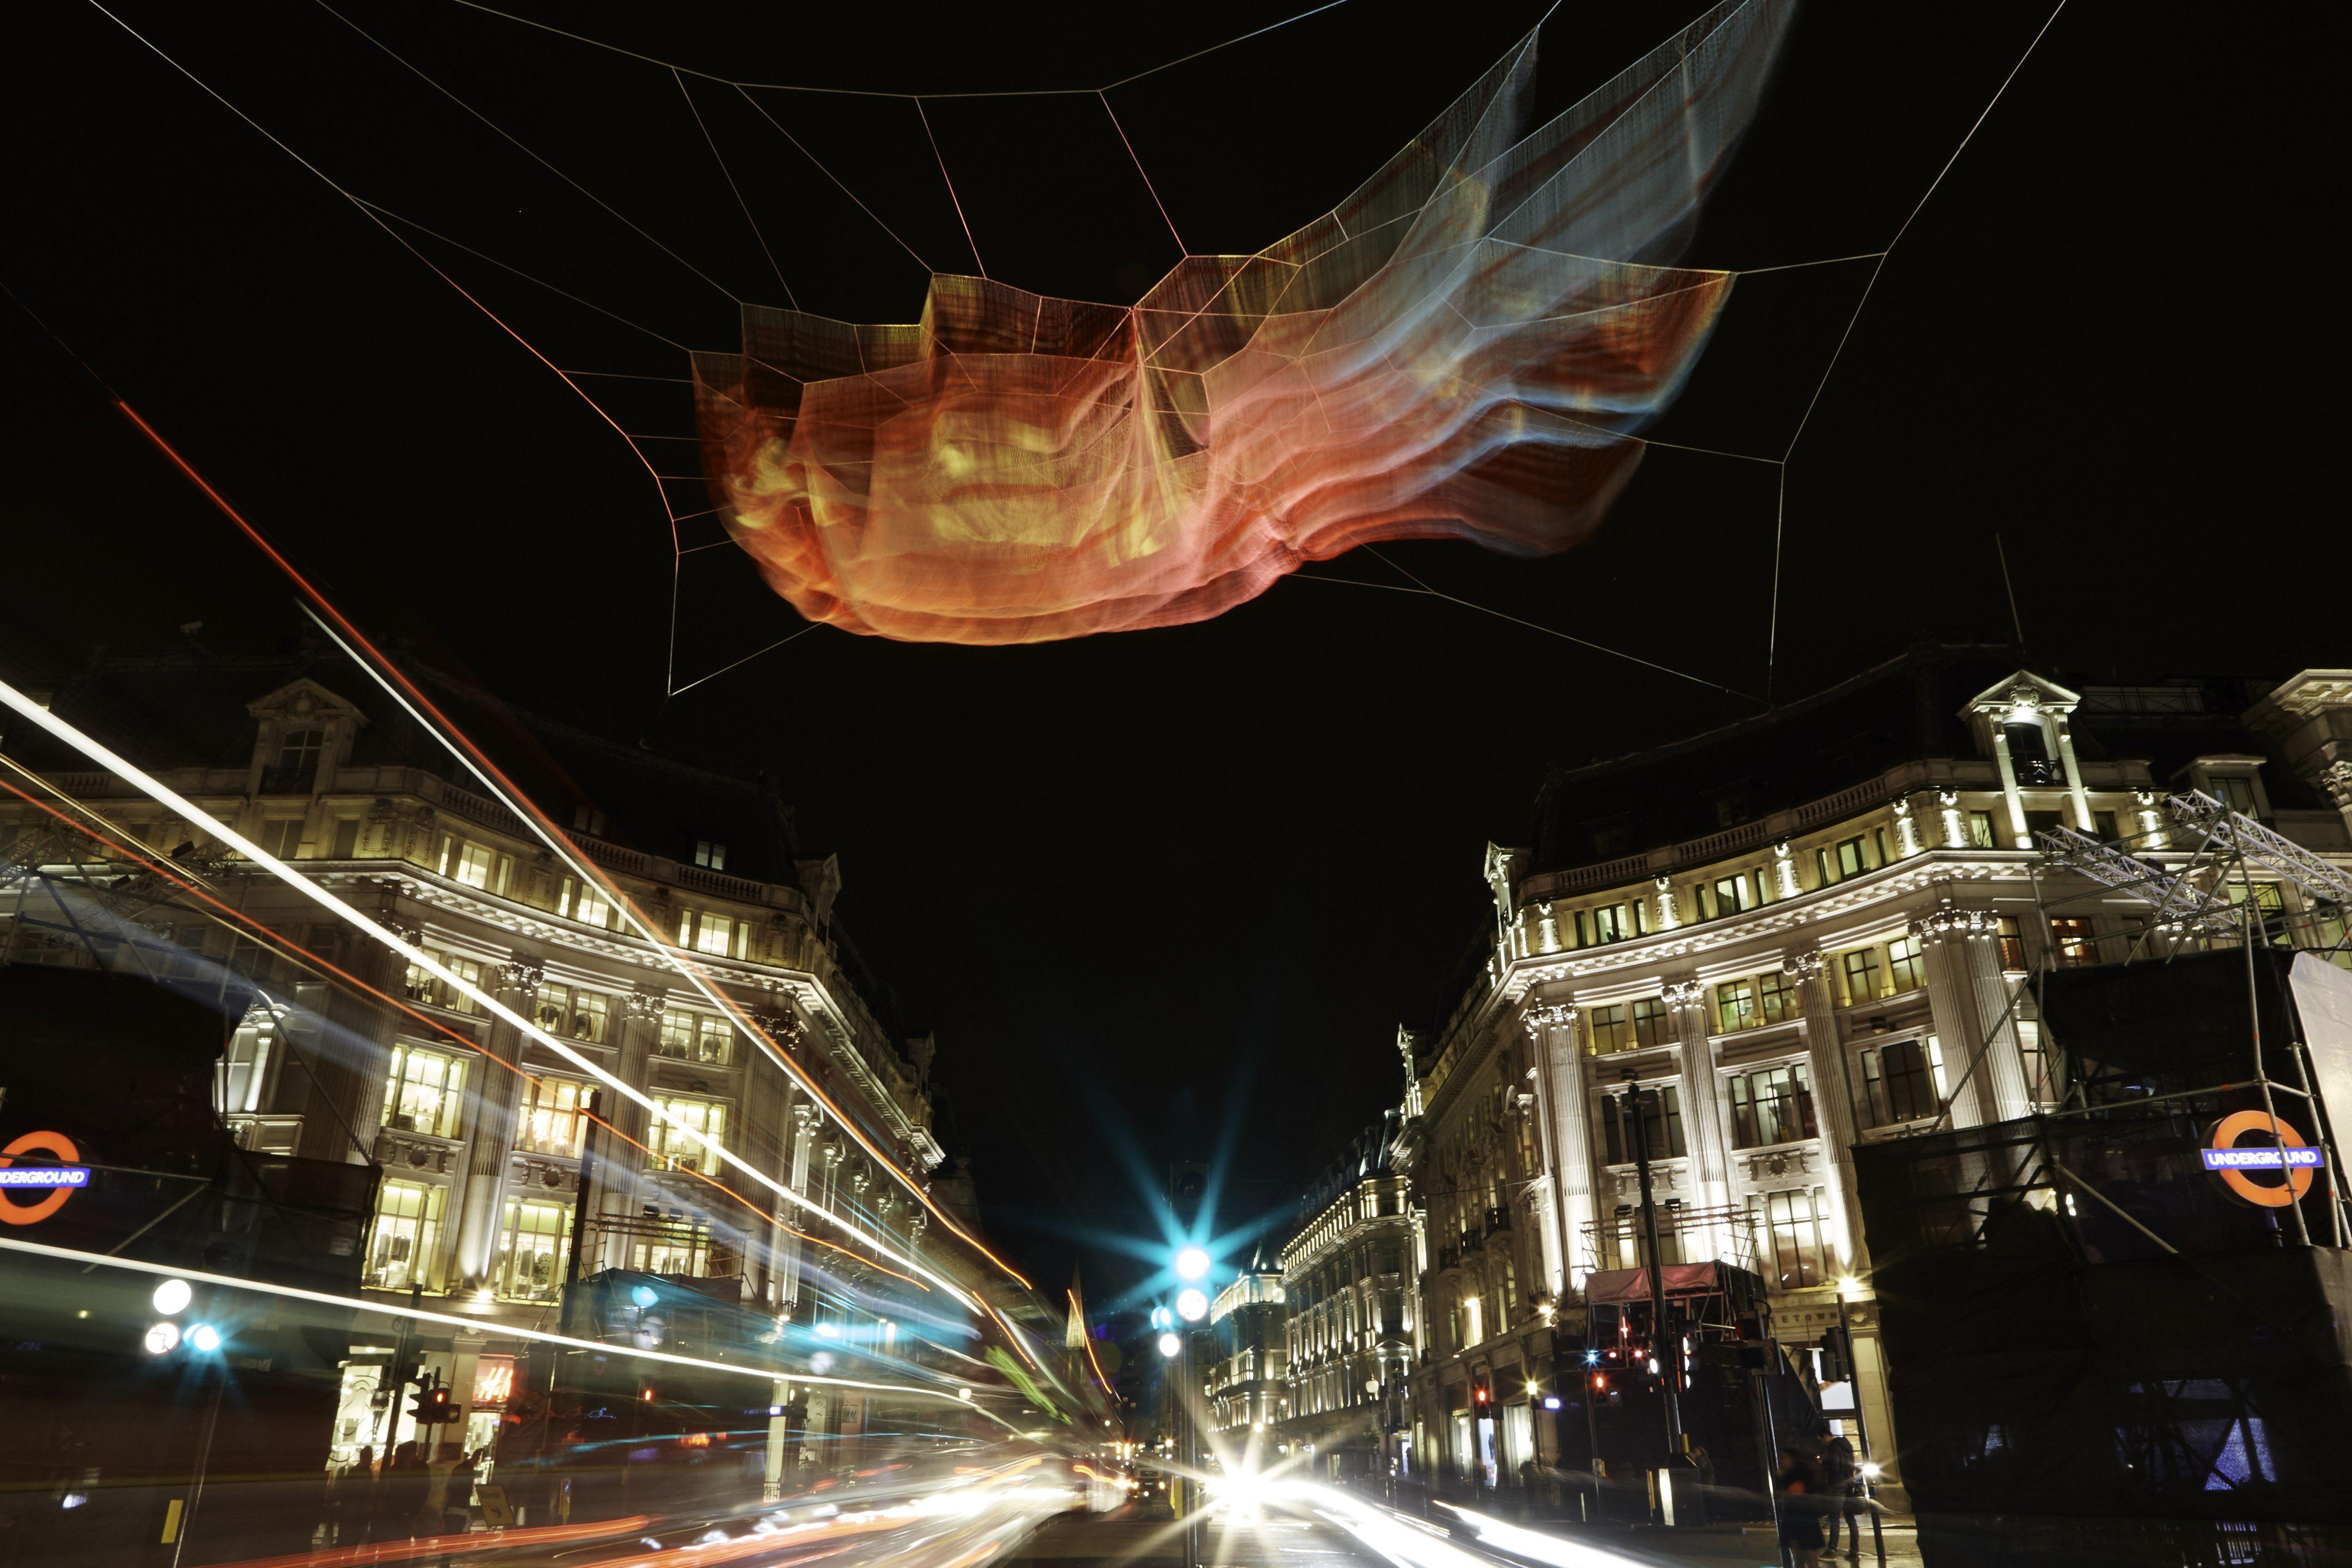 RegentStreetW1 is dazzling from visitlondon s Lumiere London